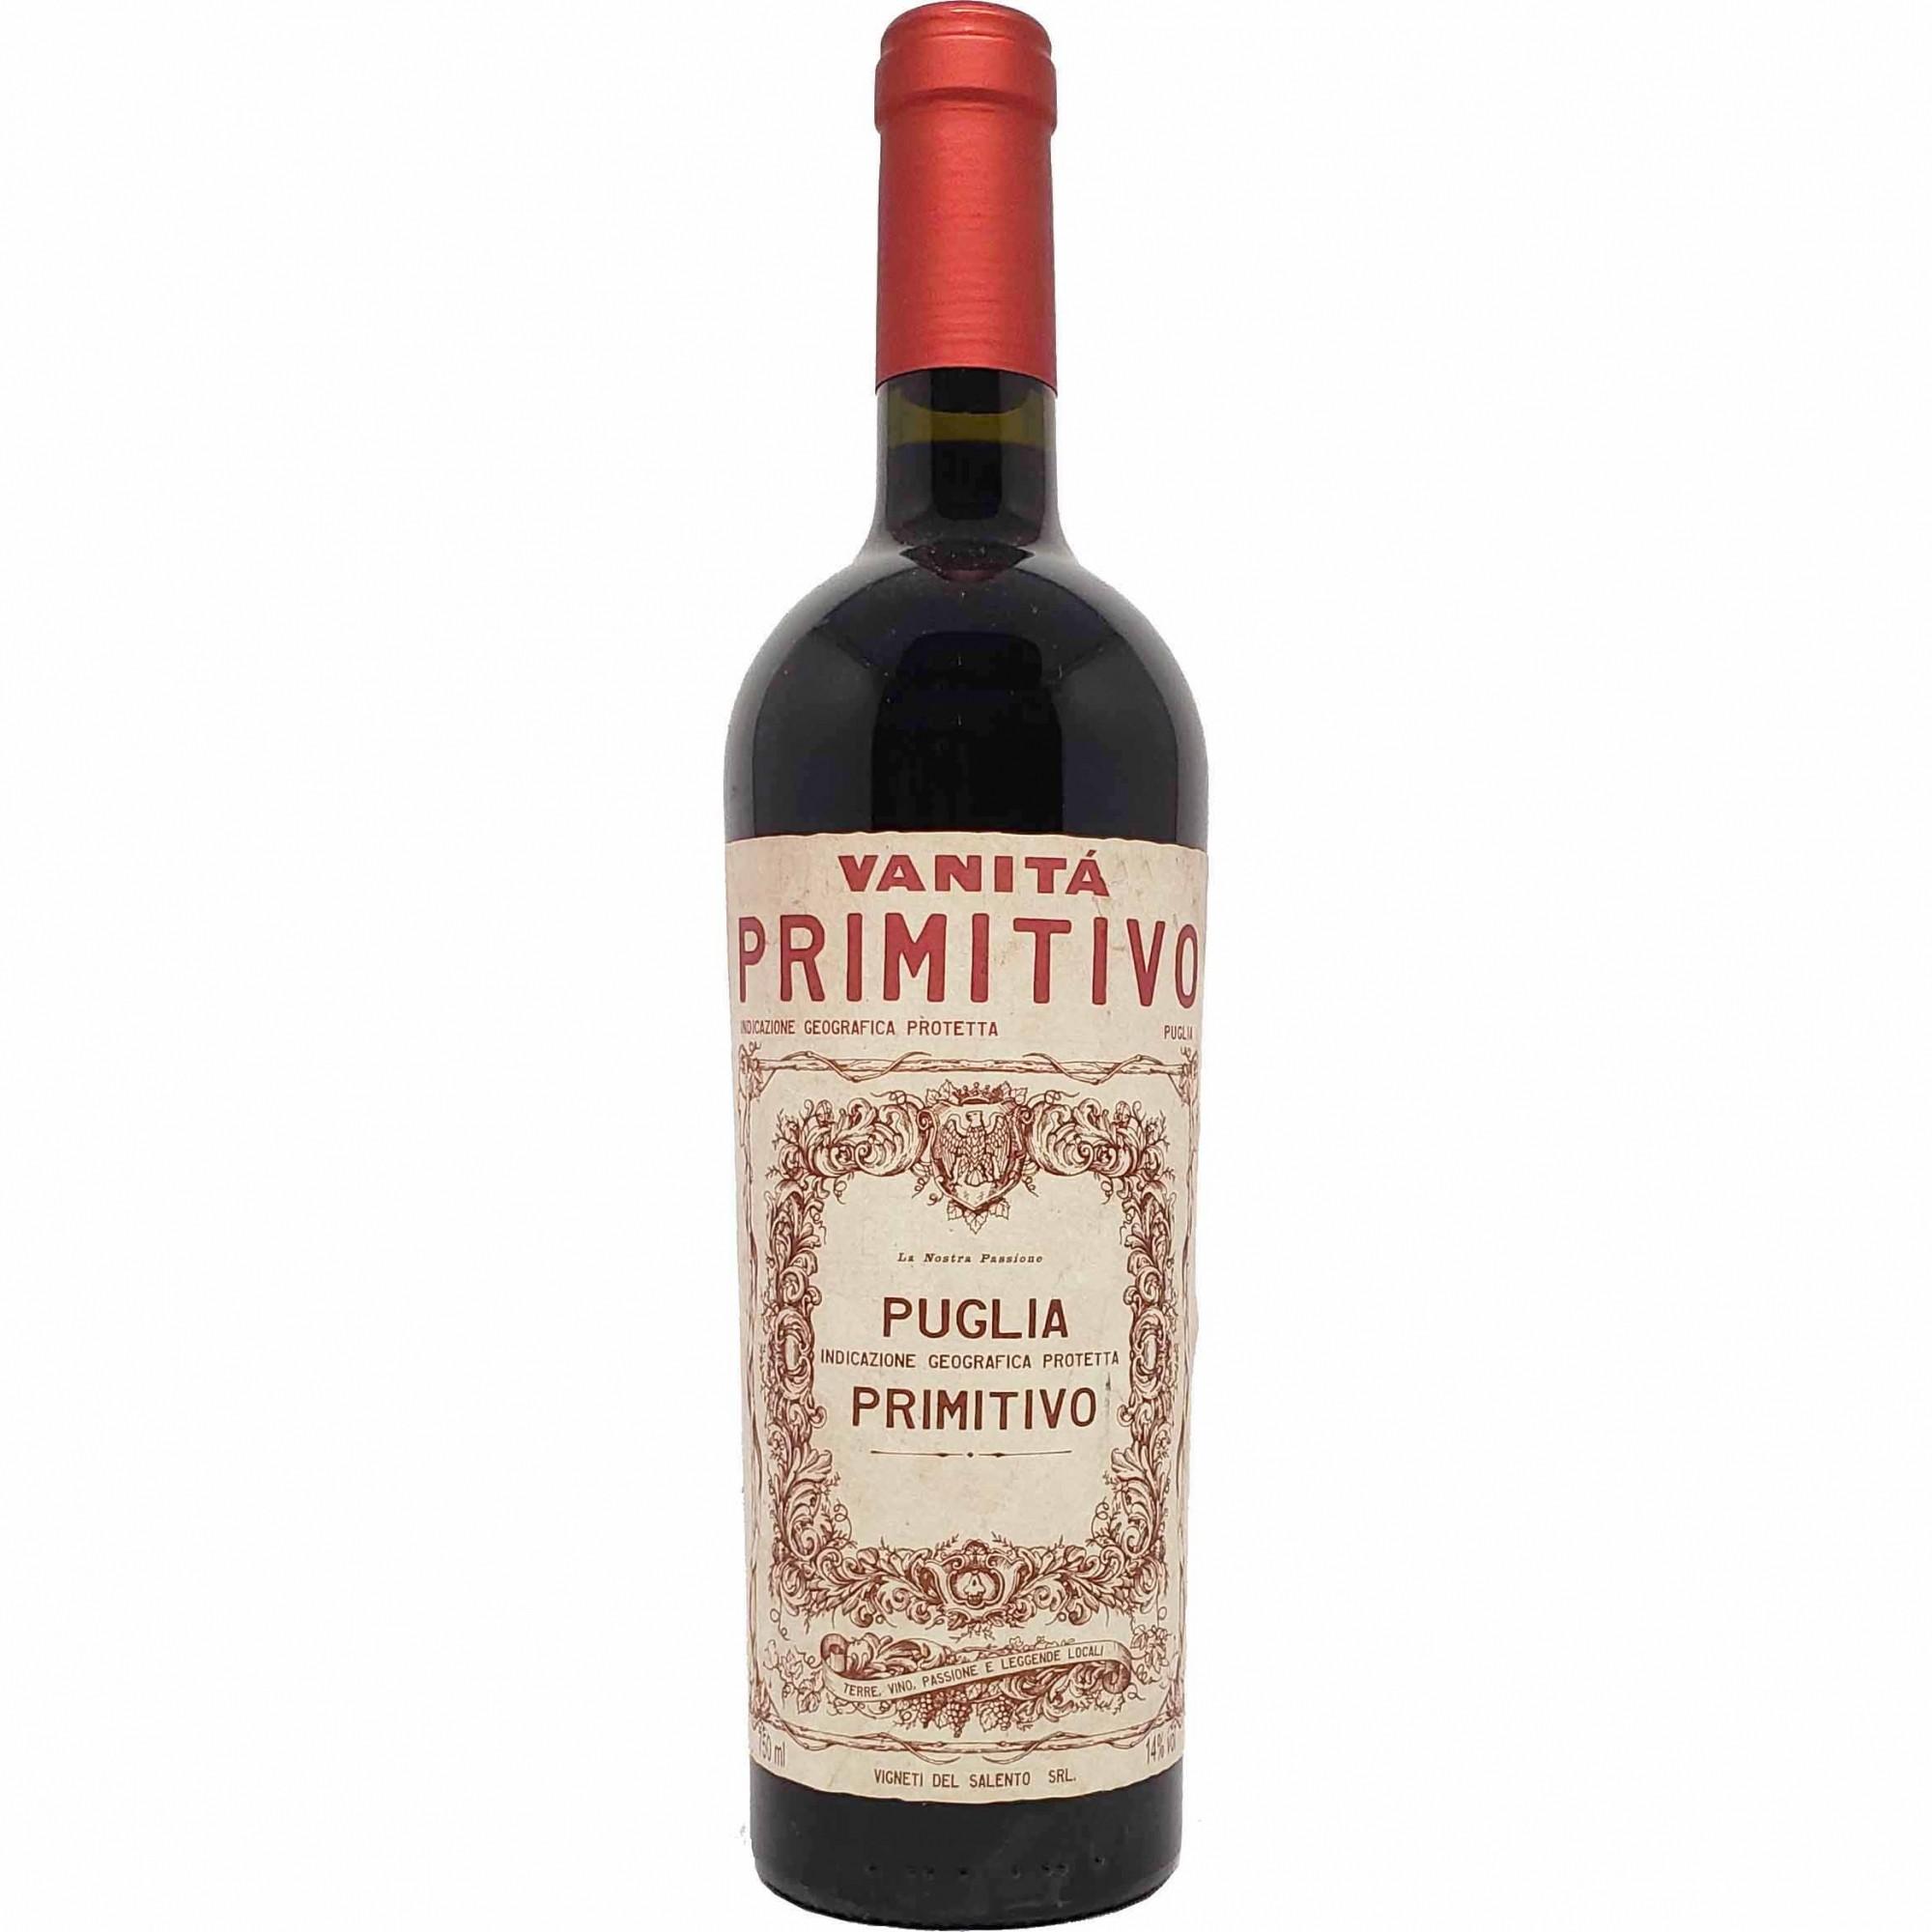 Vinho Tinto Vanitá Primitivo Puglia - 750ml -